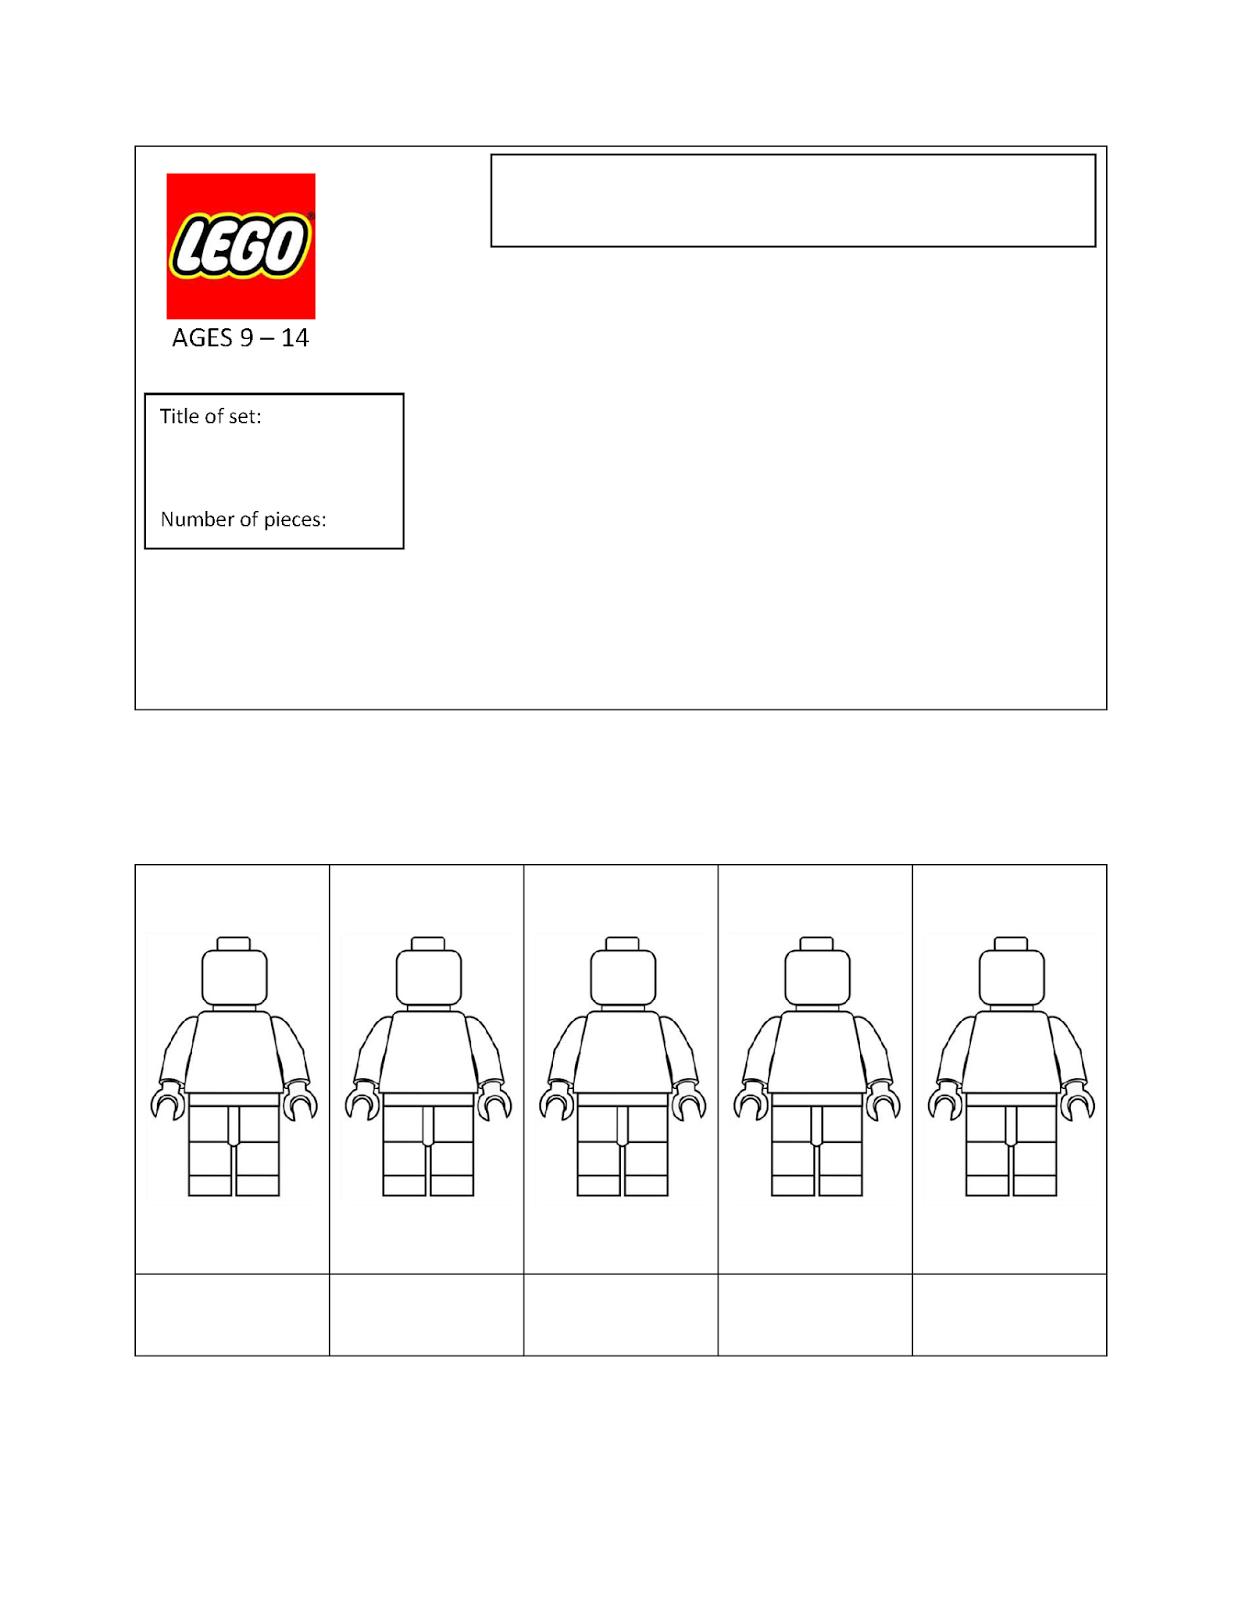 Lego Templates Lego Packaging Lego Minifigures